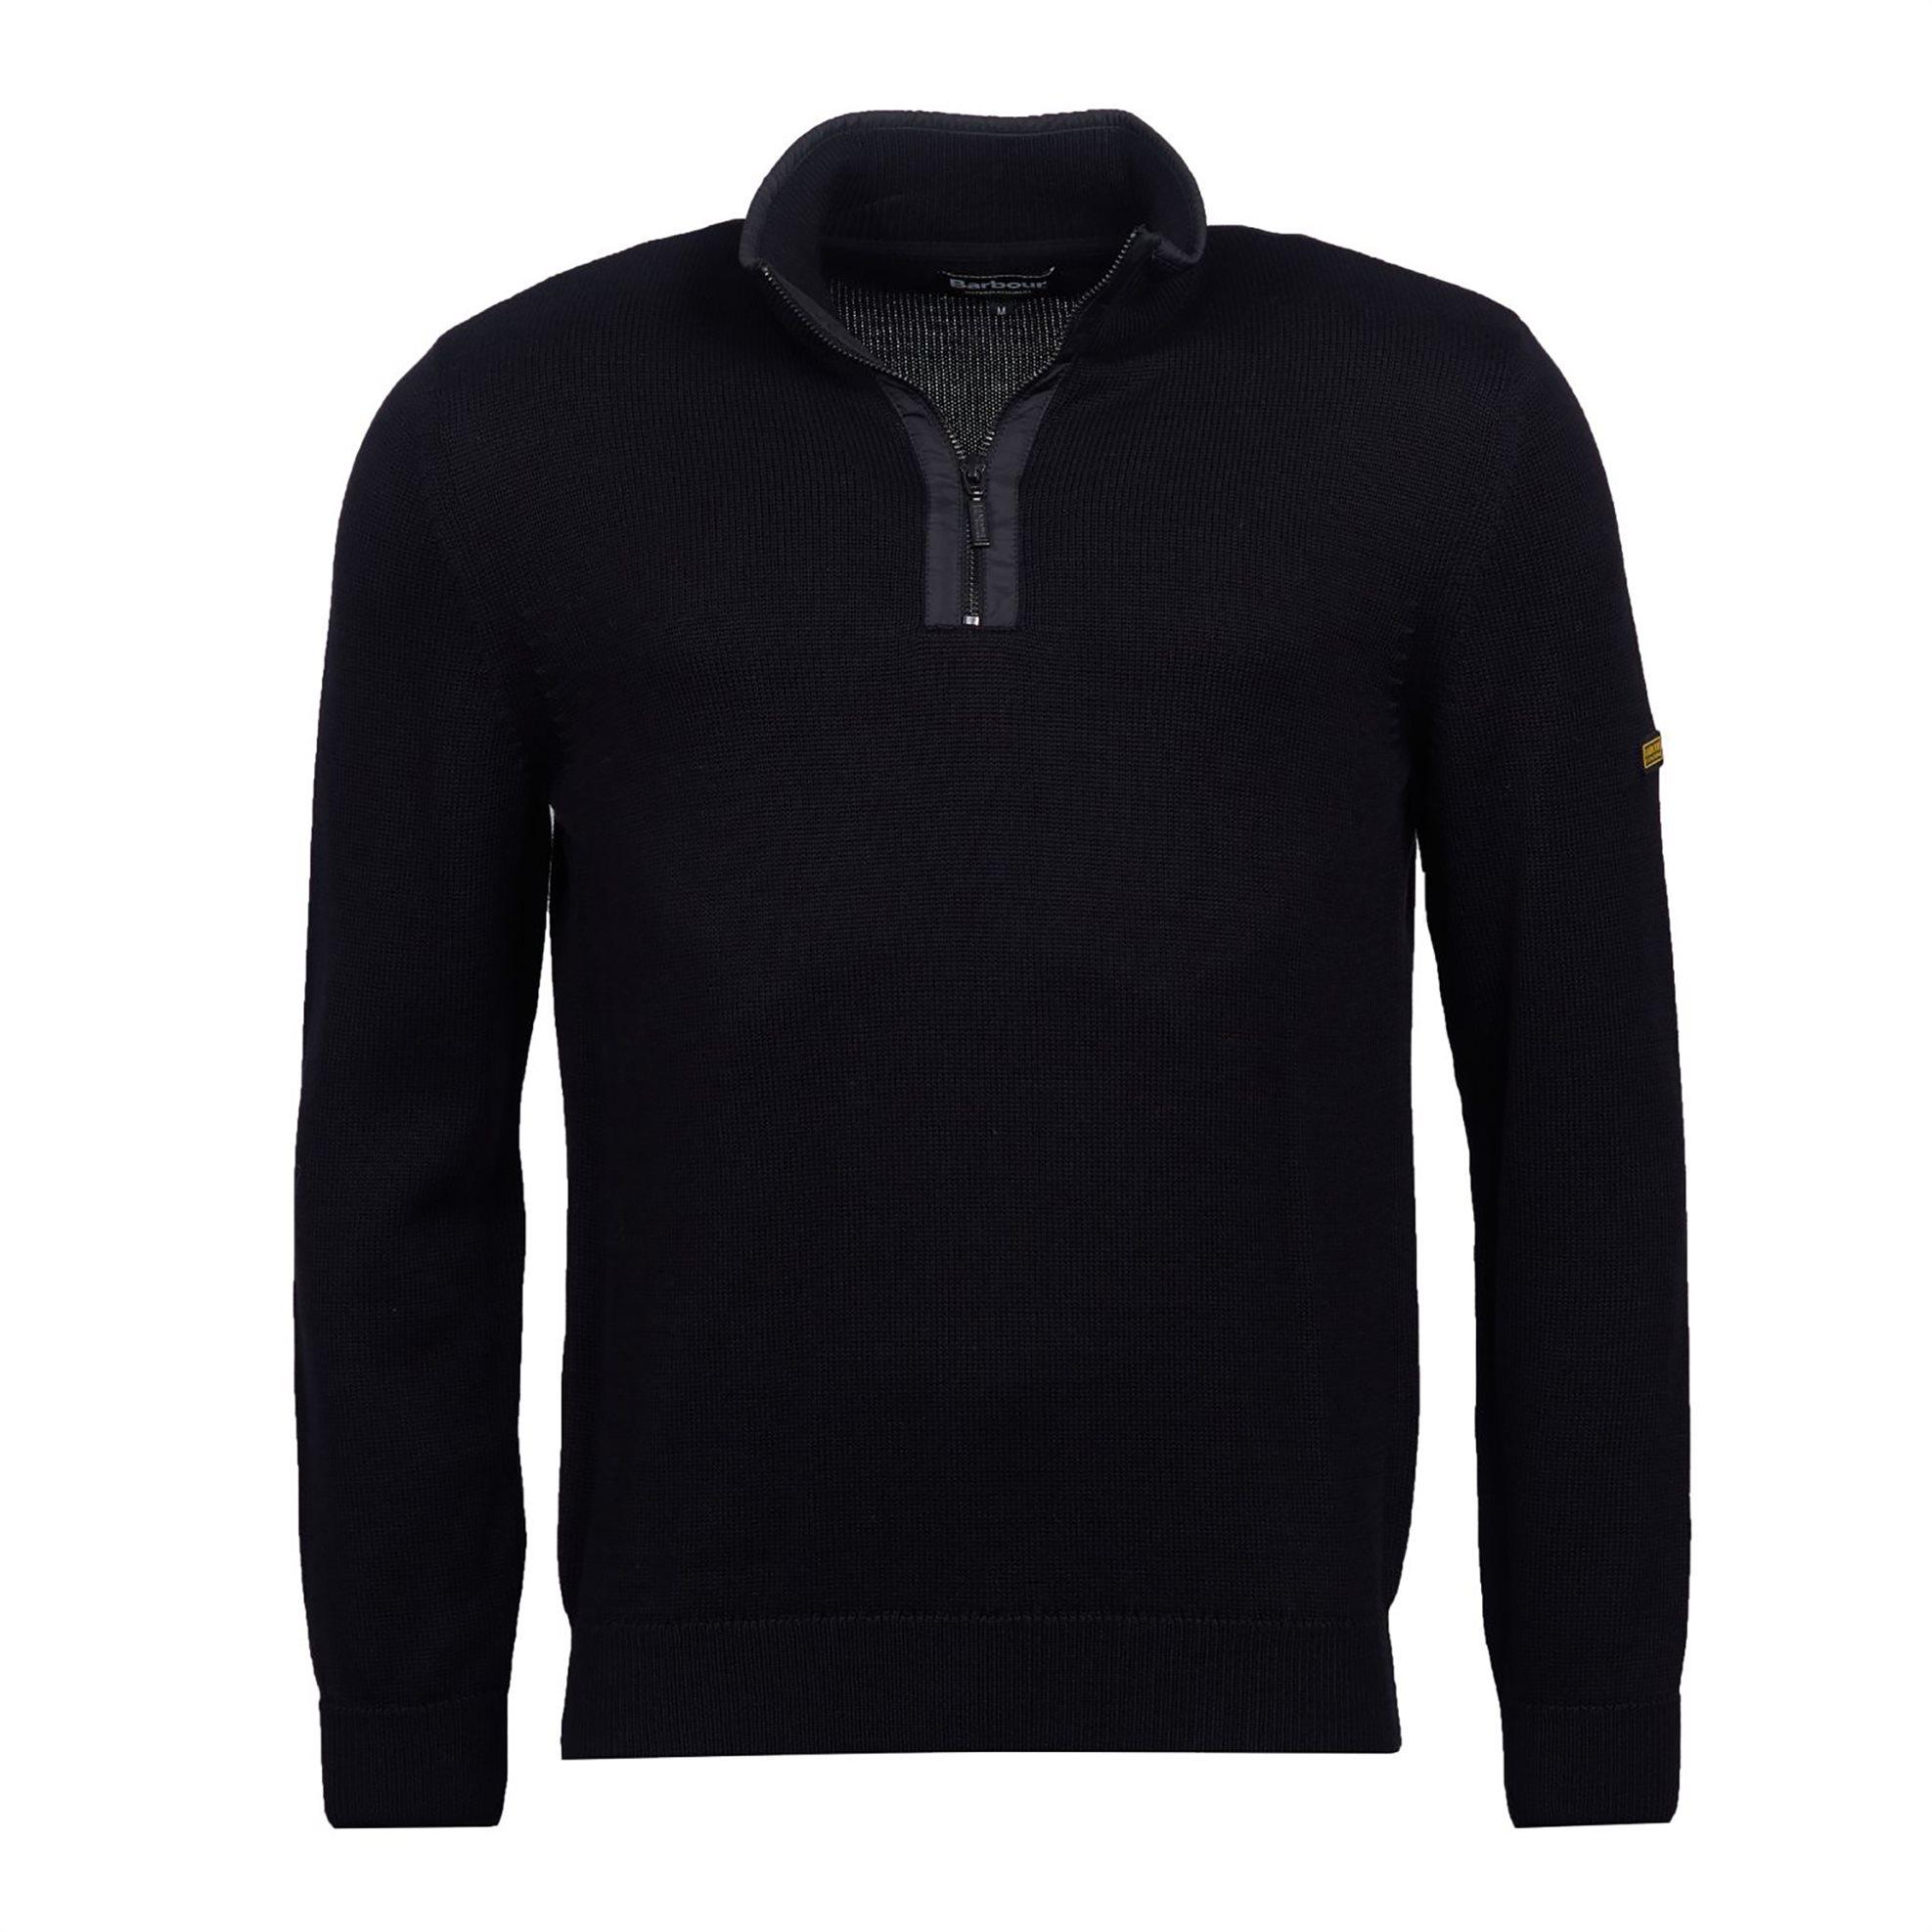 Barbour ανδρικό πλεκτό με φερμουάρ 3/4 - MKN1150 - Μαύρο ανδρασ   ρουχα   πλεκτά   πουλόβερ